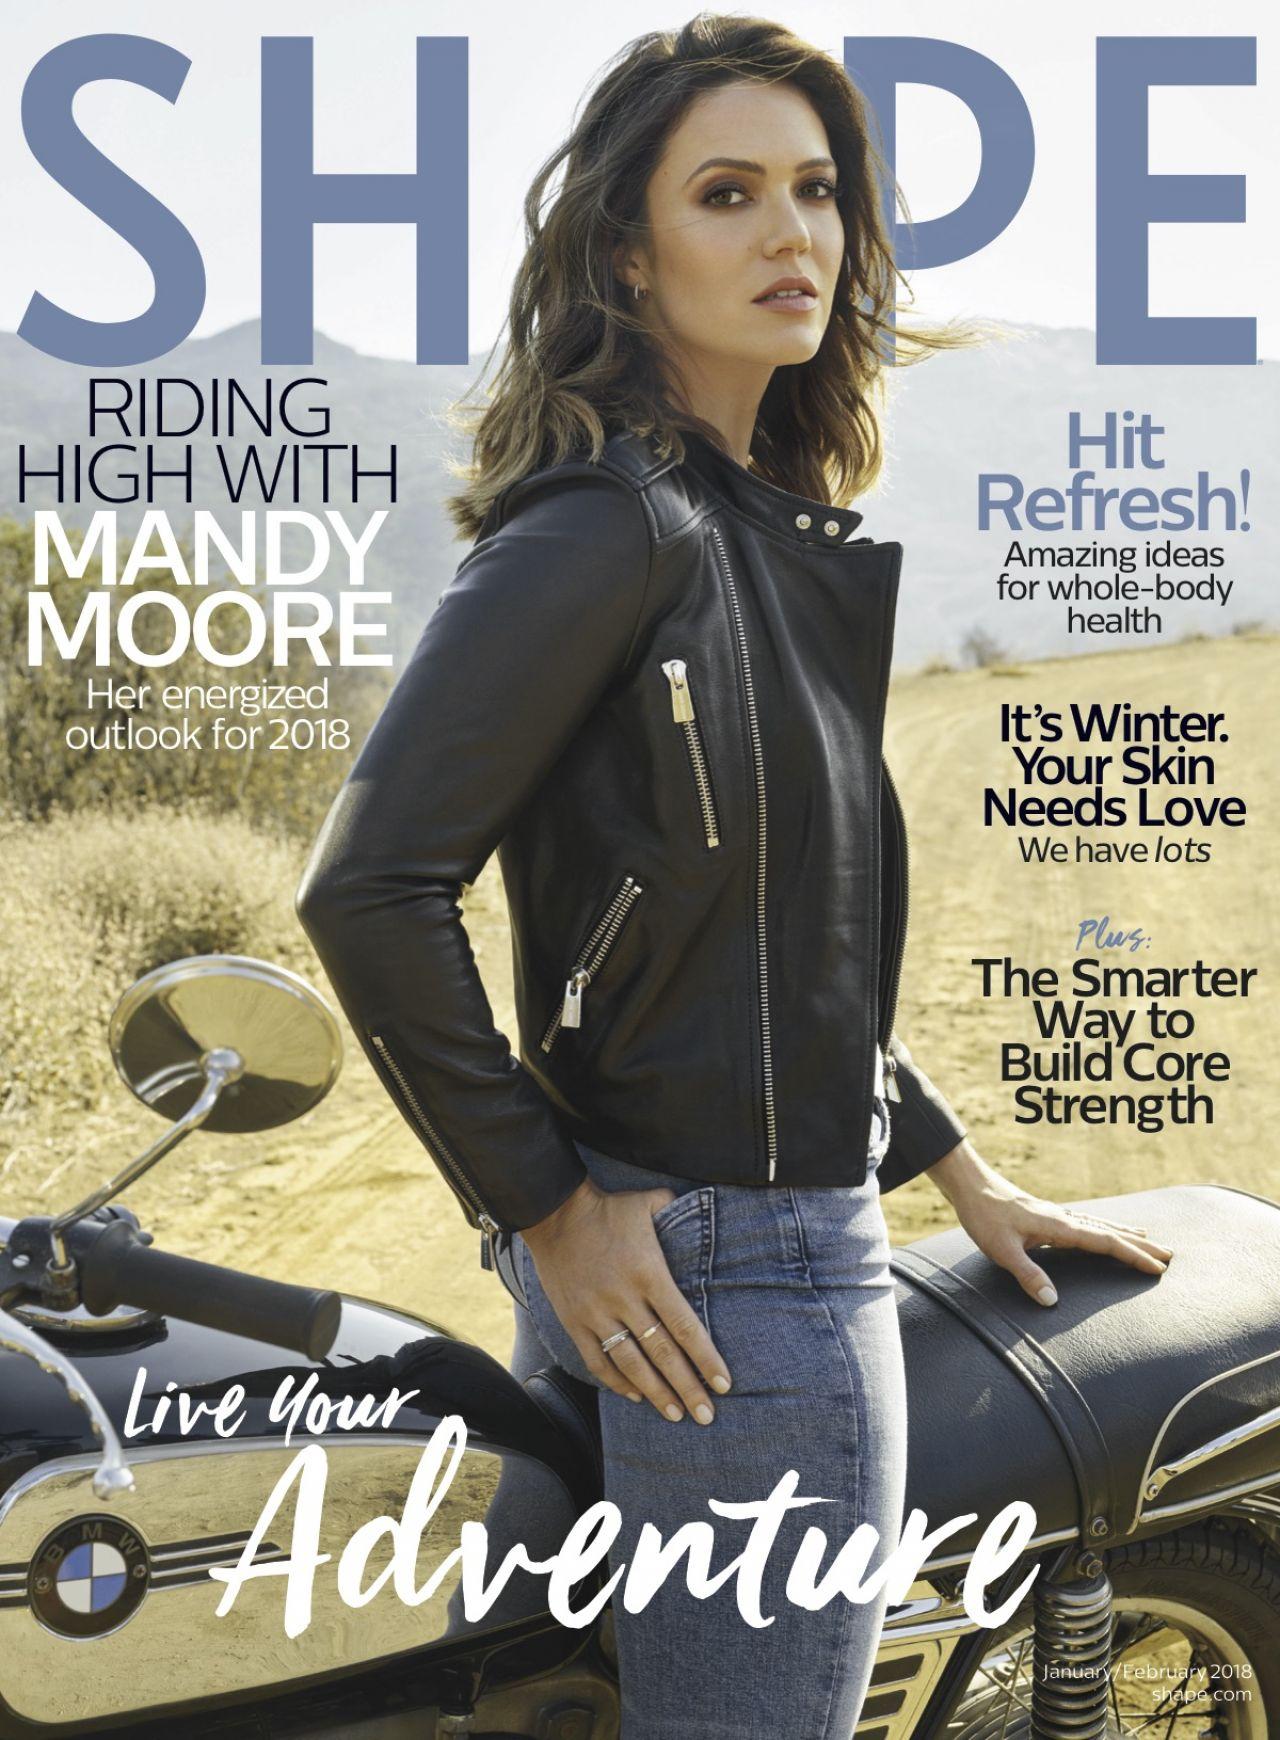 http://celebmafia.com/wp-content/uploads/2017/12/mandy-moore-shape-magazine-january-february-2018-issue-3.jpg